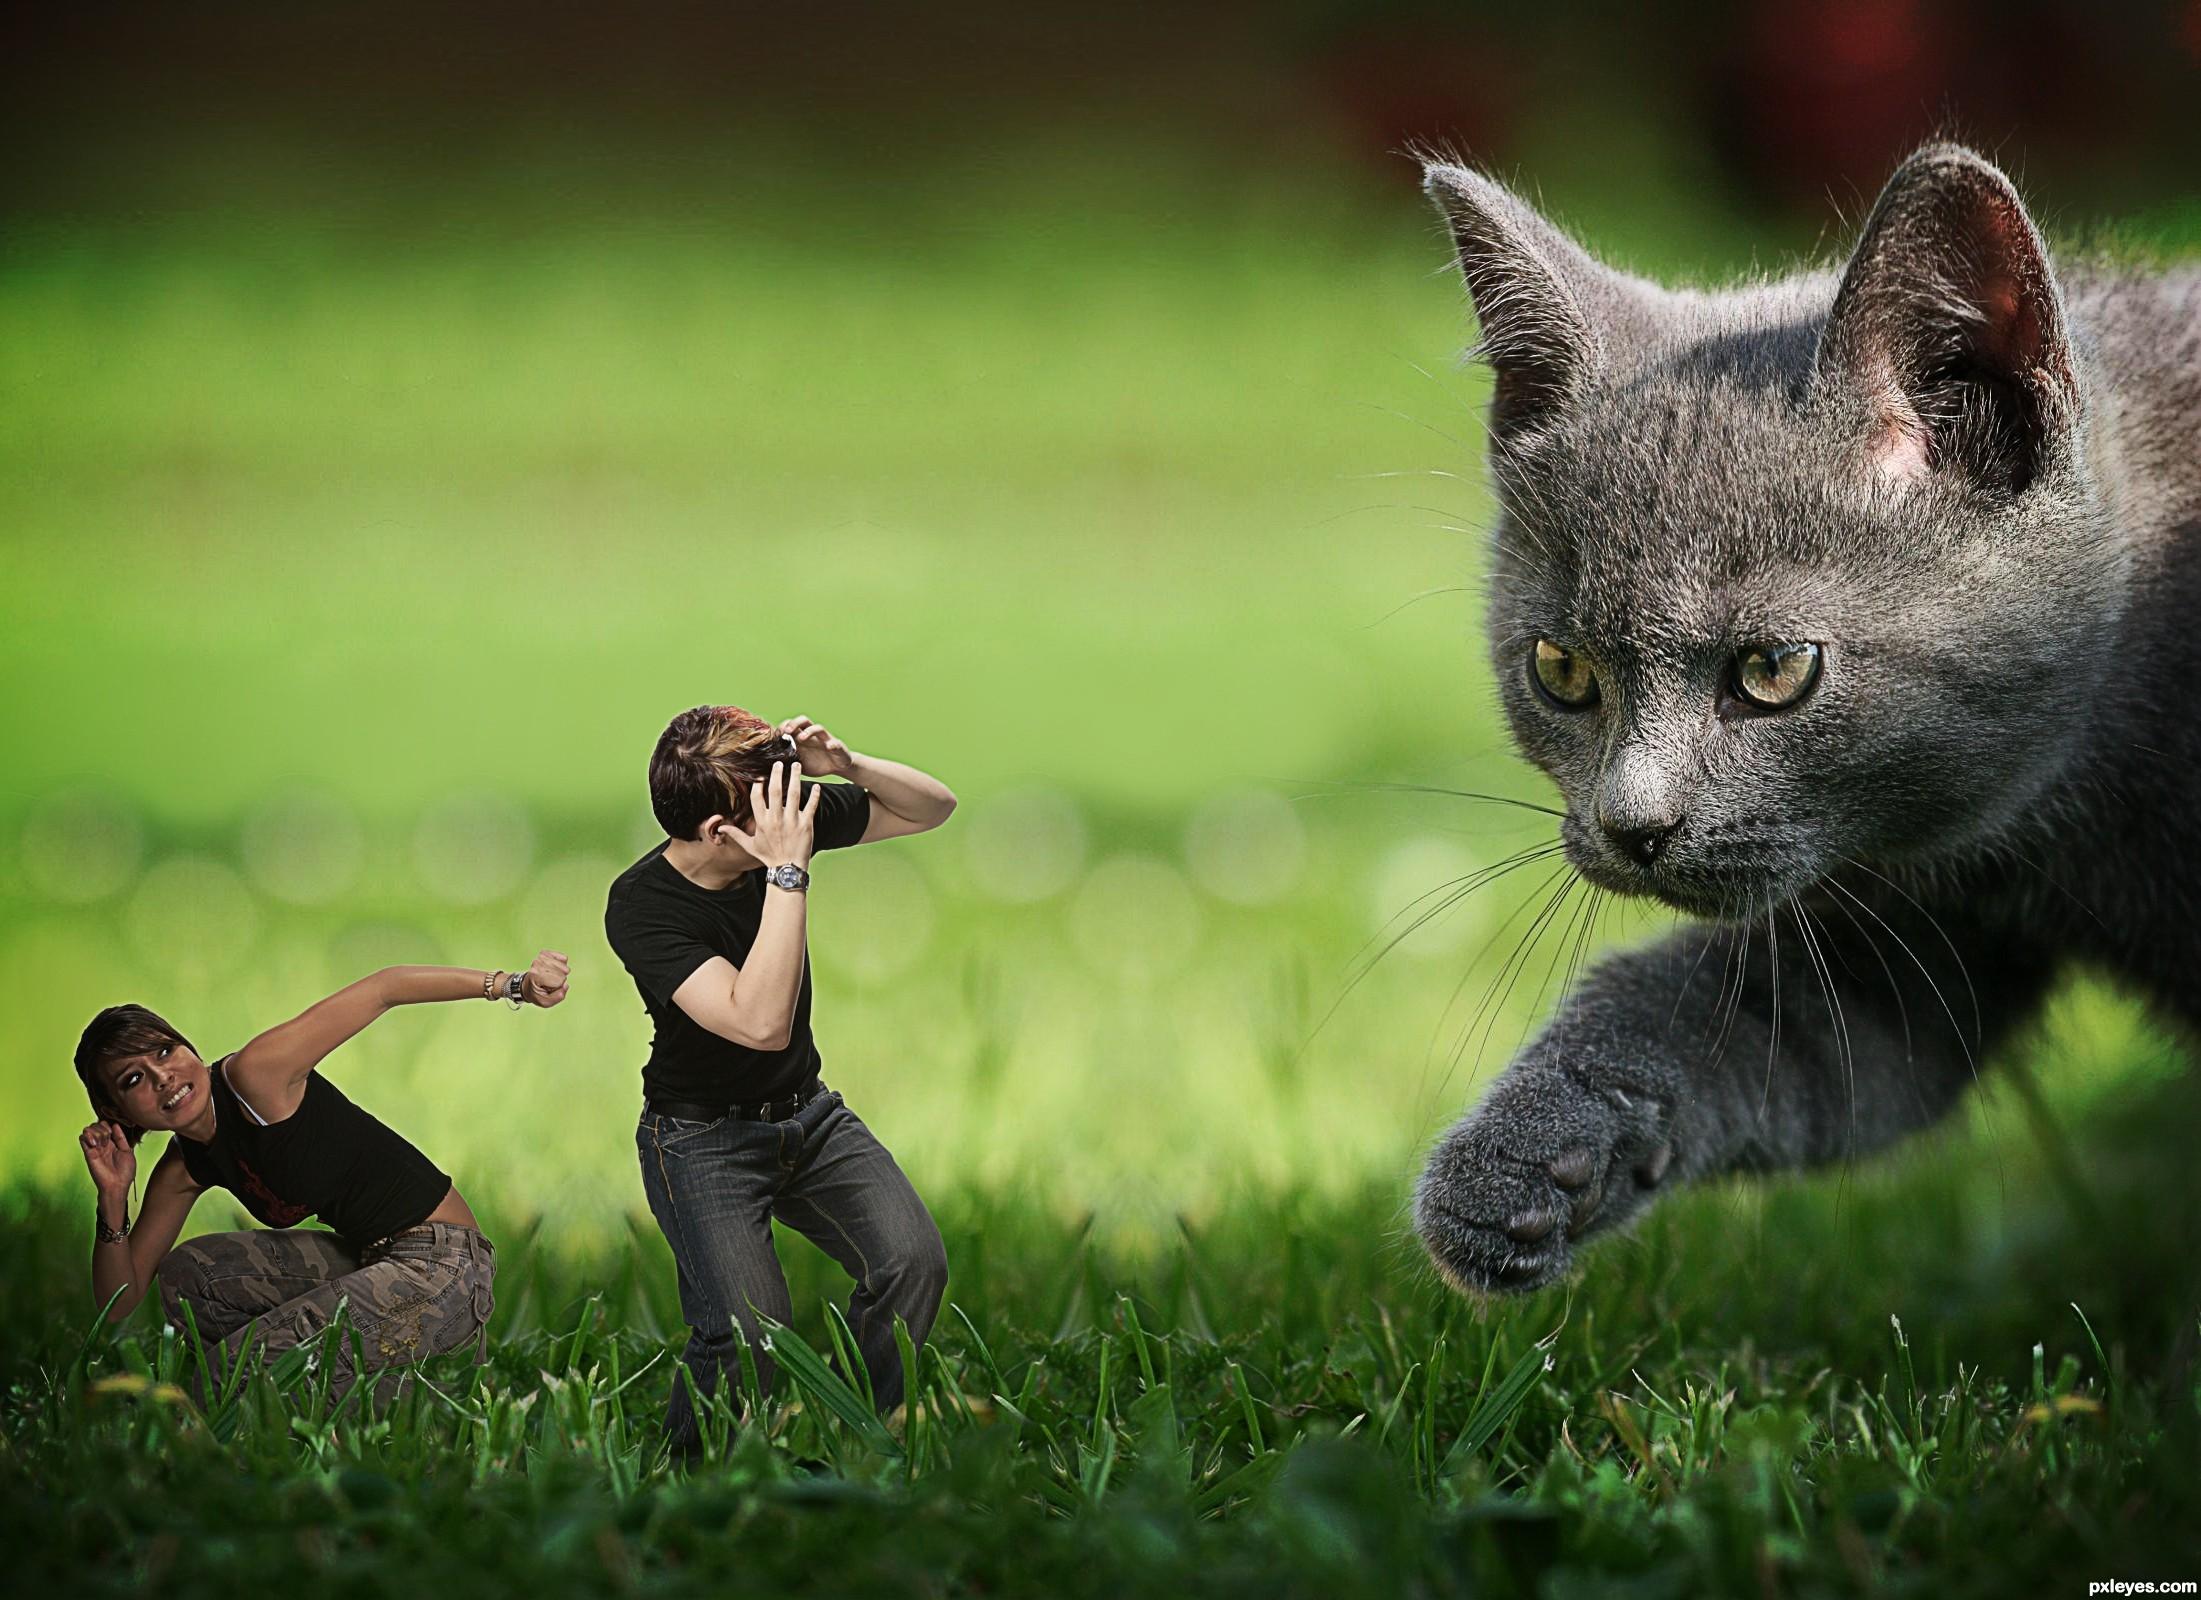 [Image: Cat-Attack-4fb645b908368_hires.jpg]